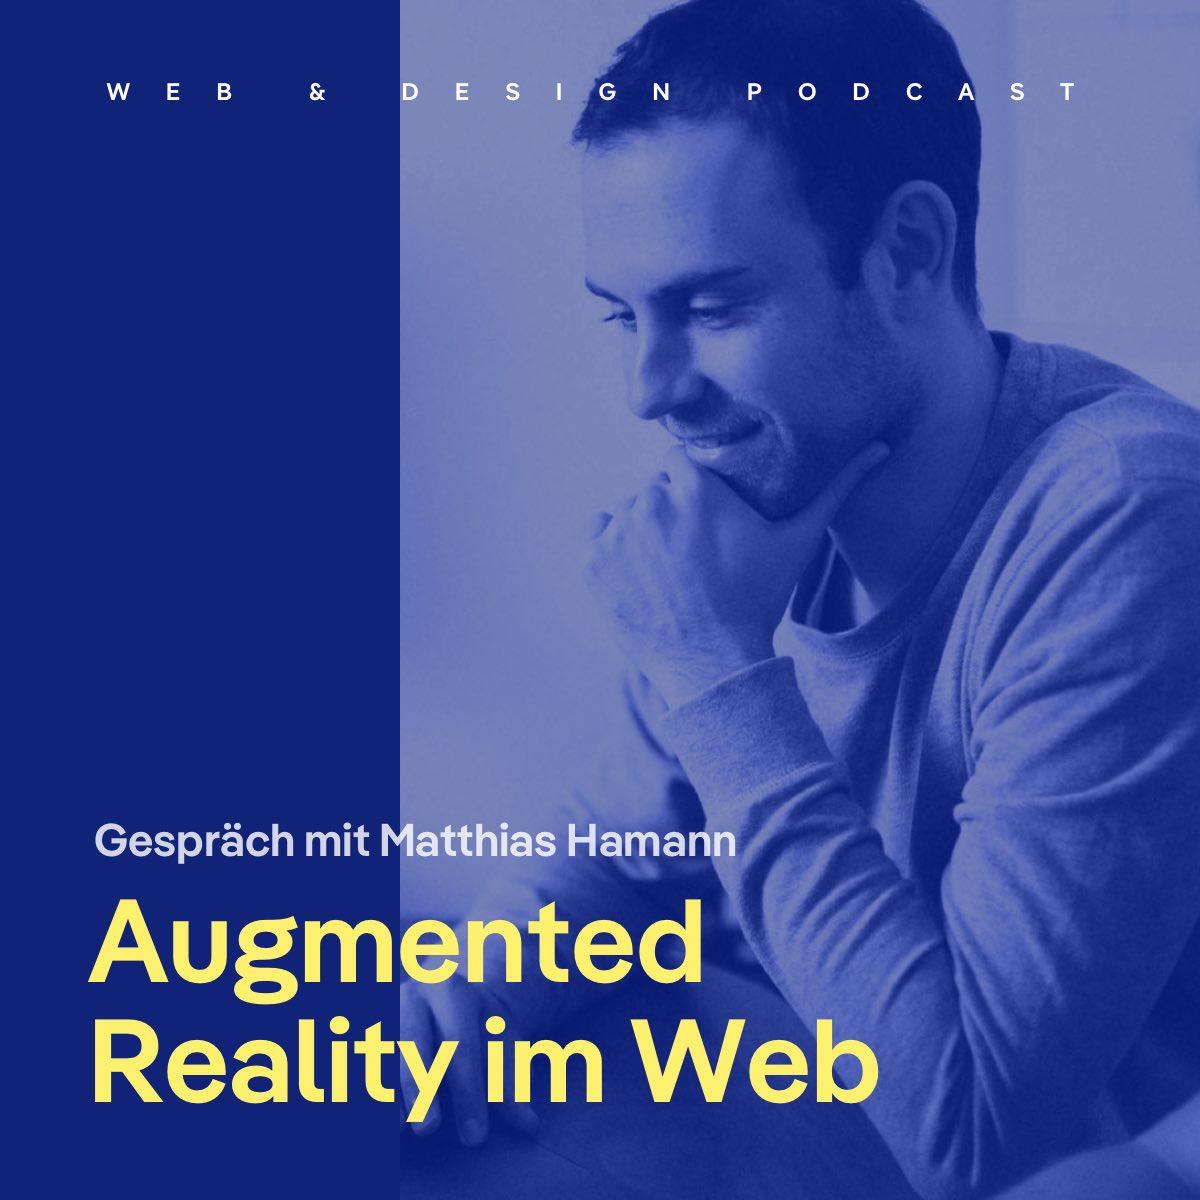 Augmented Reality im Web: 10+ Anwendungsbeispiele